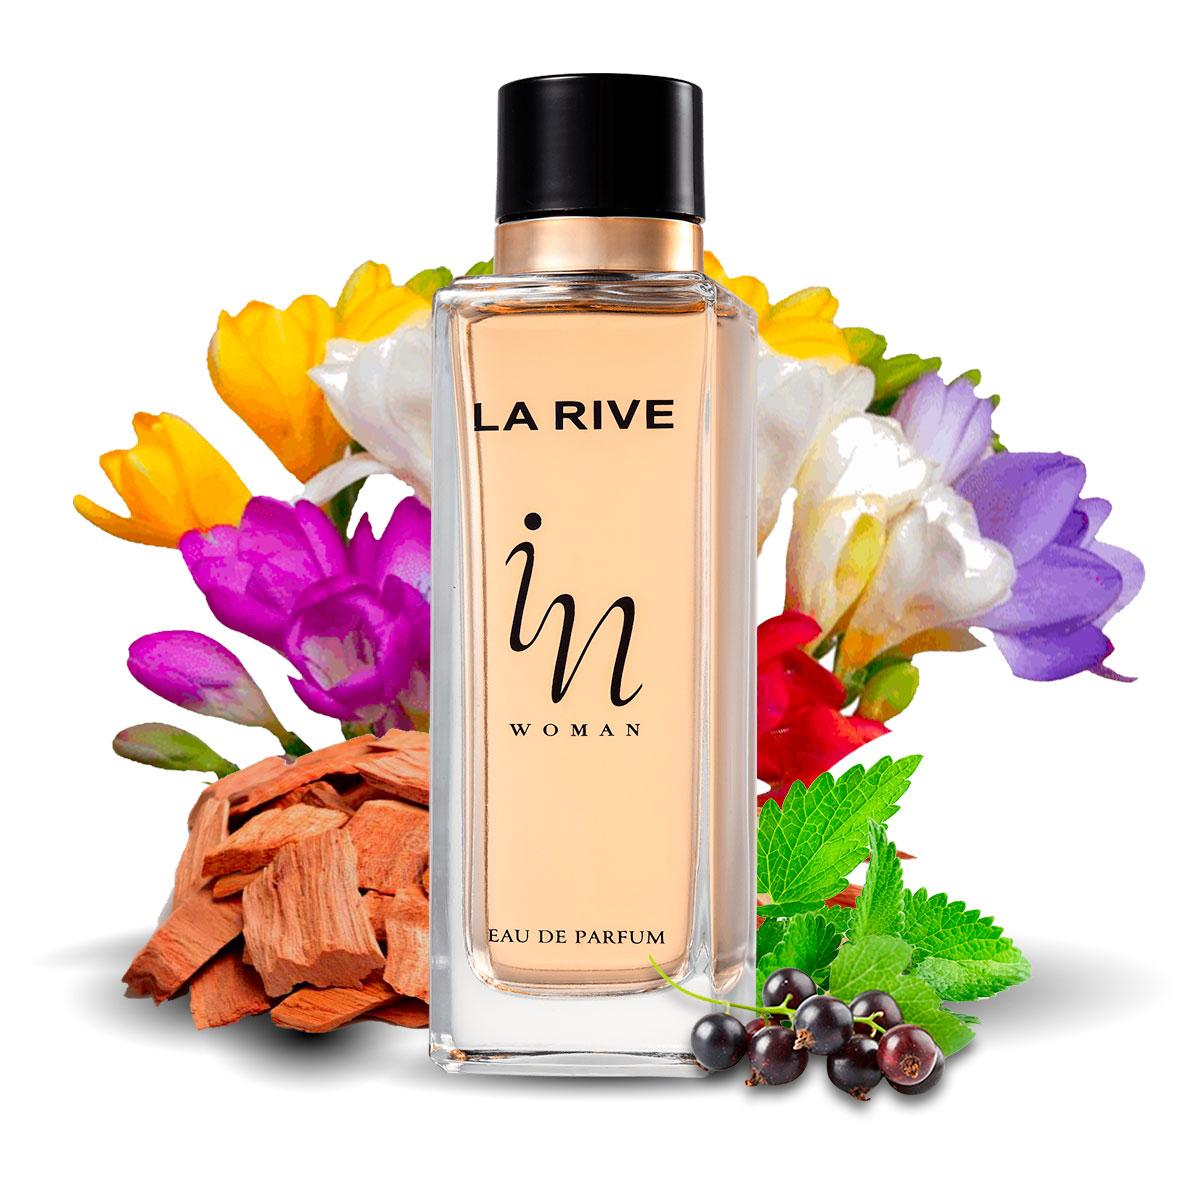 Kit 2 Perfumes Importados Miss Dream e In Woman La Rive